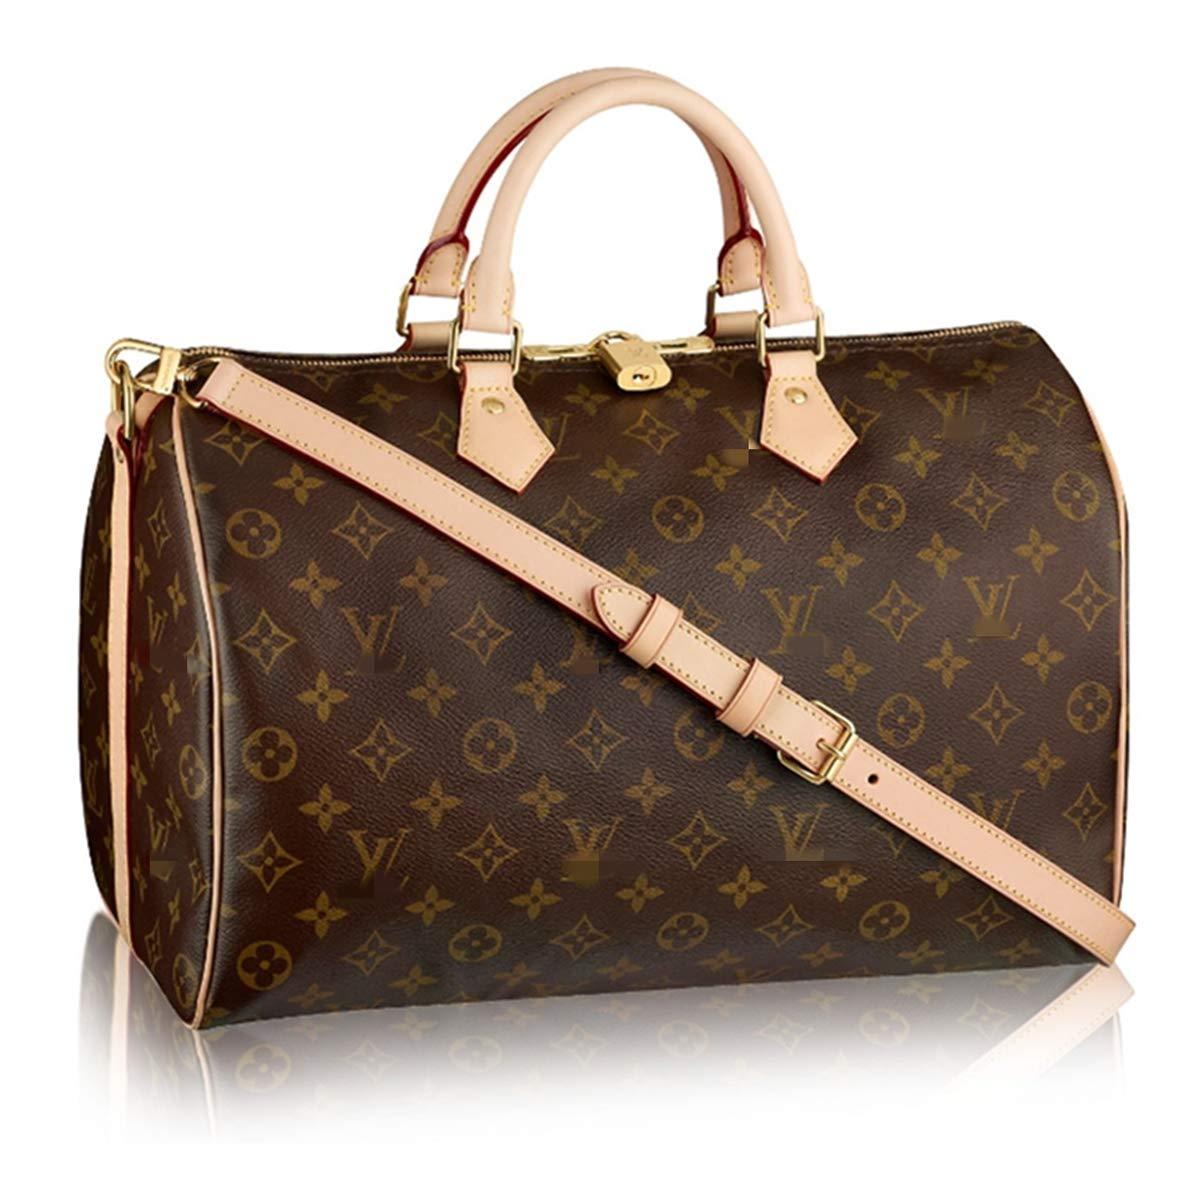 Brown Bags Forest Leather Handbags 2pcs Set for Women Fashion Purse Shouler Totes Bags